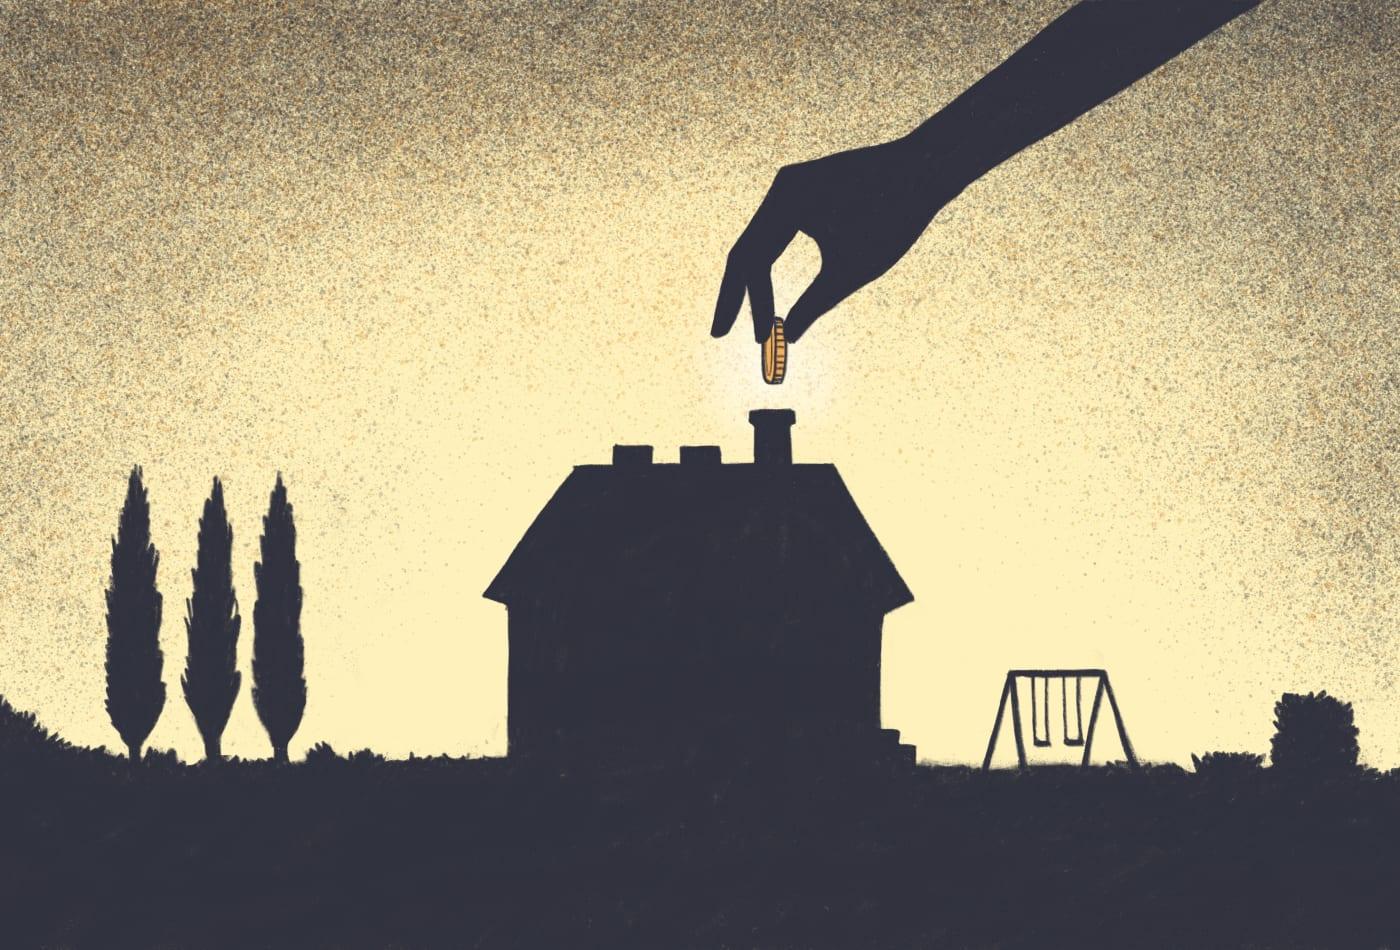 Australian Property Investment Advice